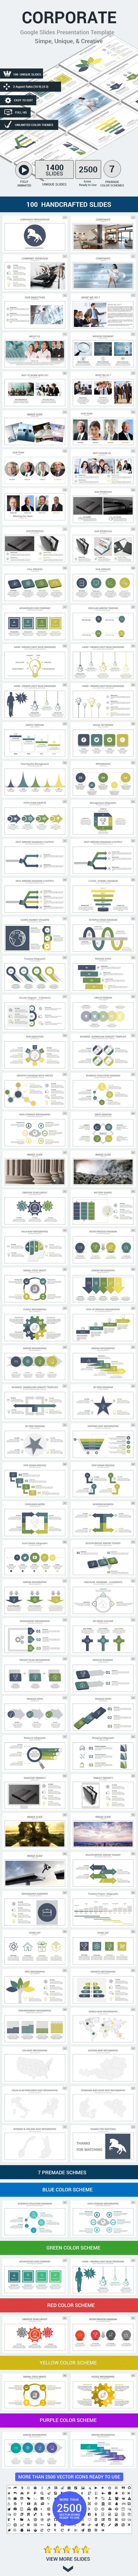 corporate google slides presentation template